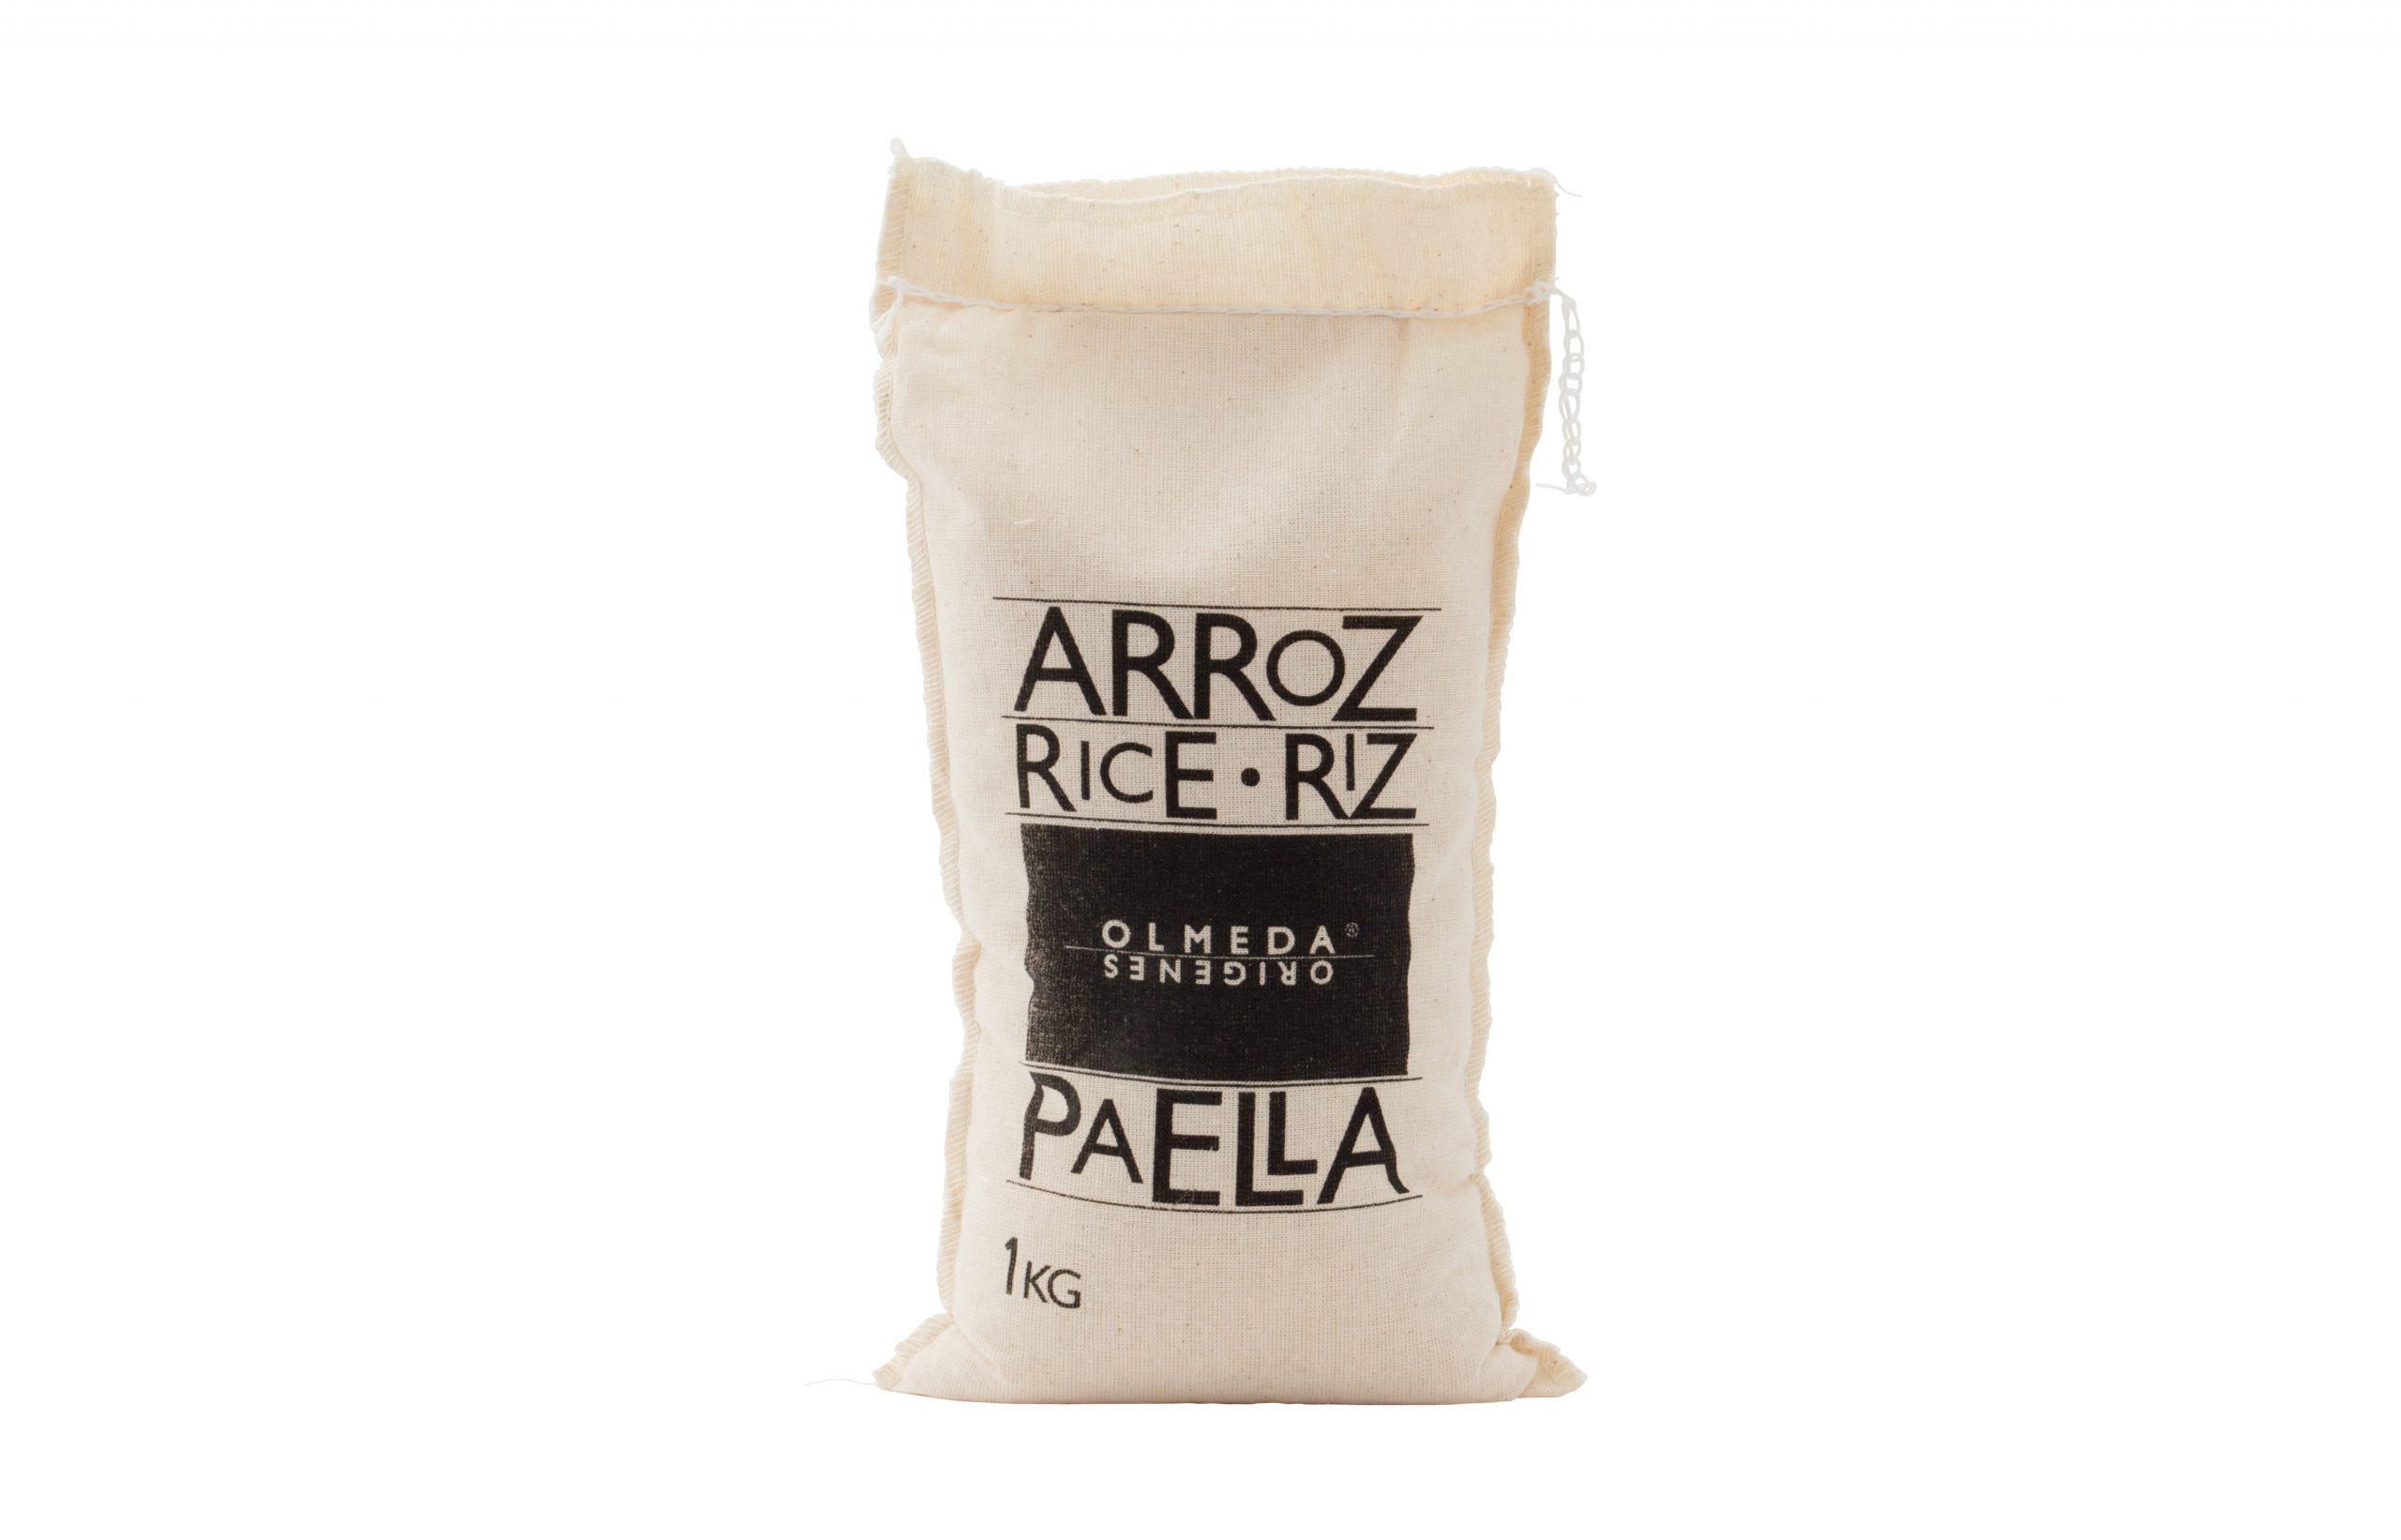 26003_ARROZ PAELLA_PAELLA RICE_OLMEDA_ORIGENES_1KG_ALTA